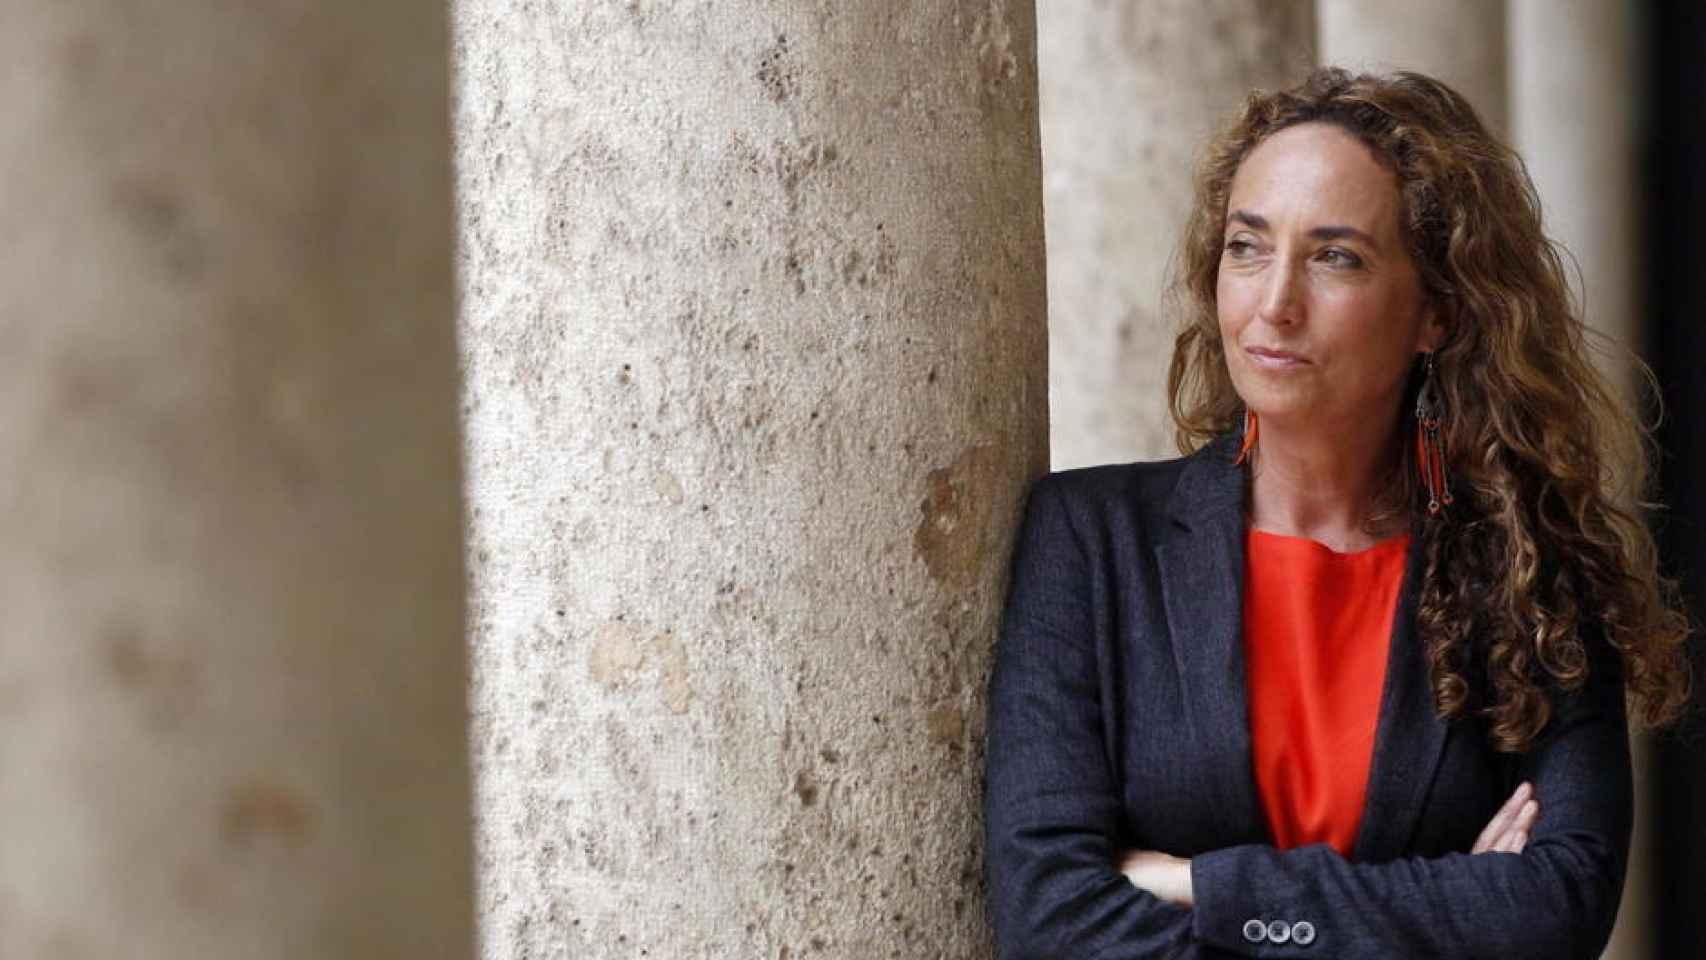 La exeurodiputada de Ciudadanos Carolina Punset.